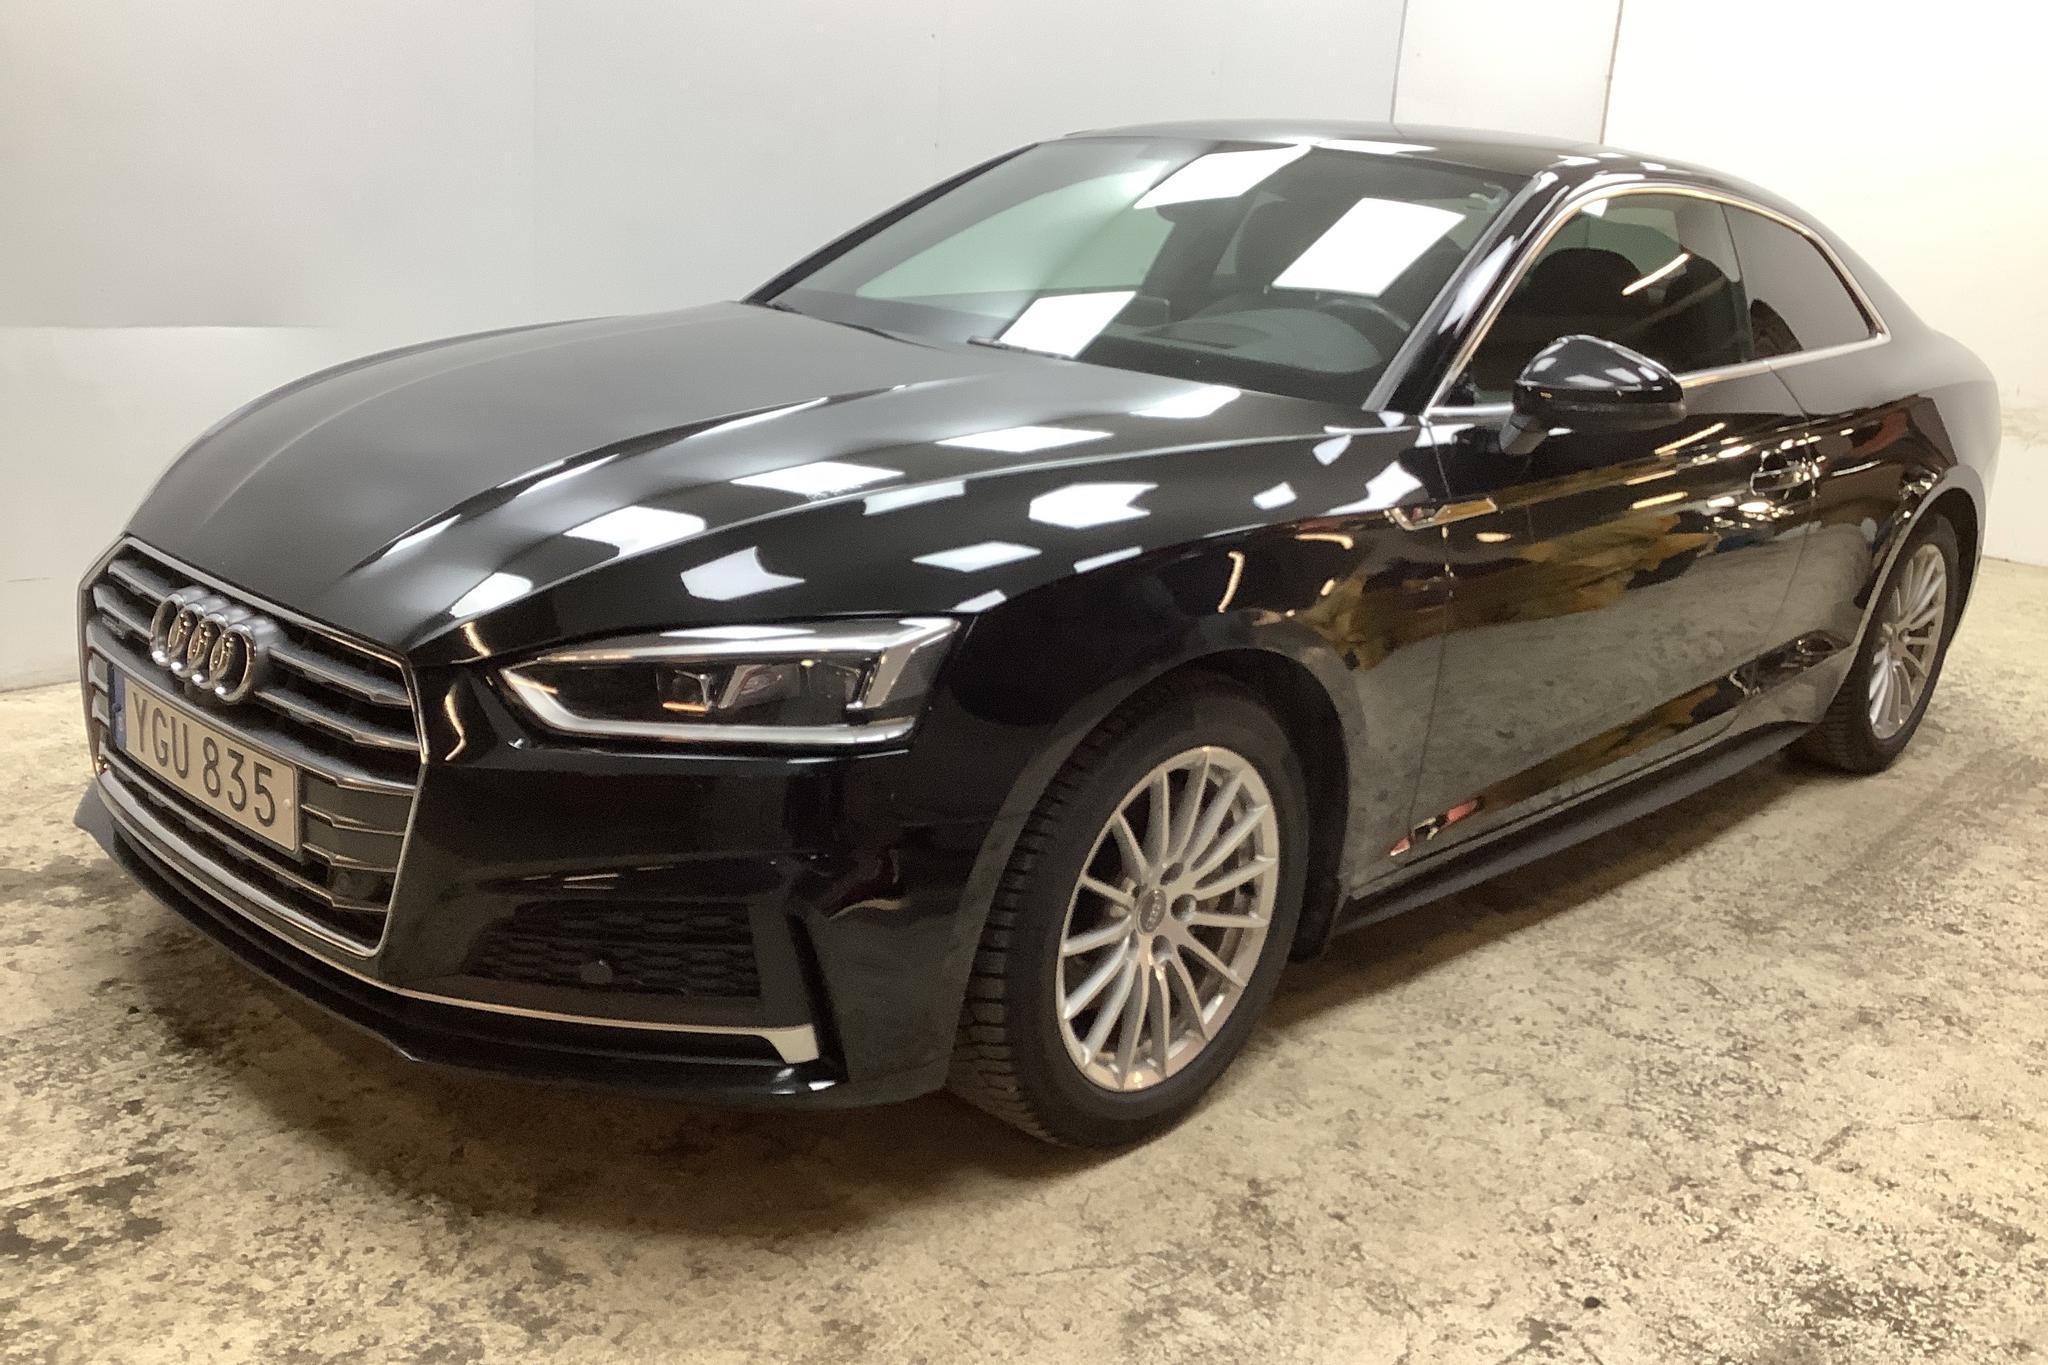 Audi A5 3.0 TDI Coupé quattro (218hk) - 51 790 km - Automatic - black - 2017